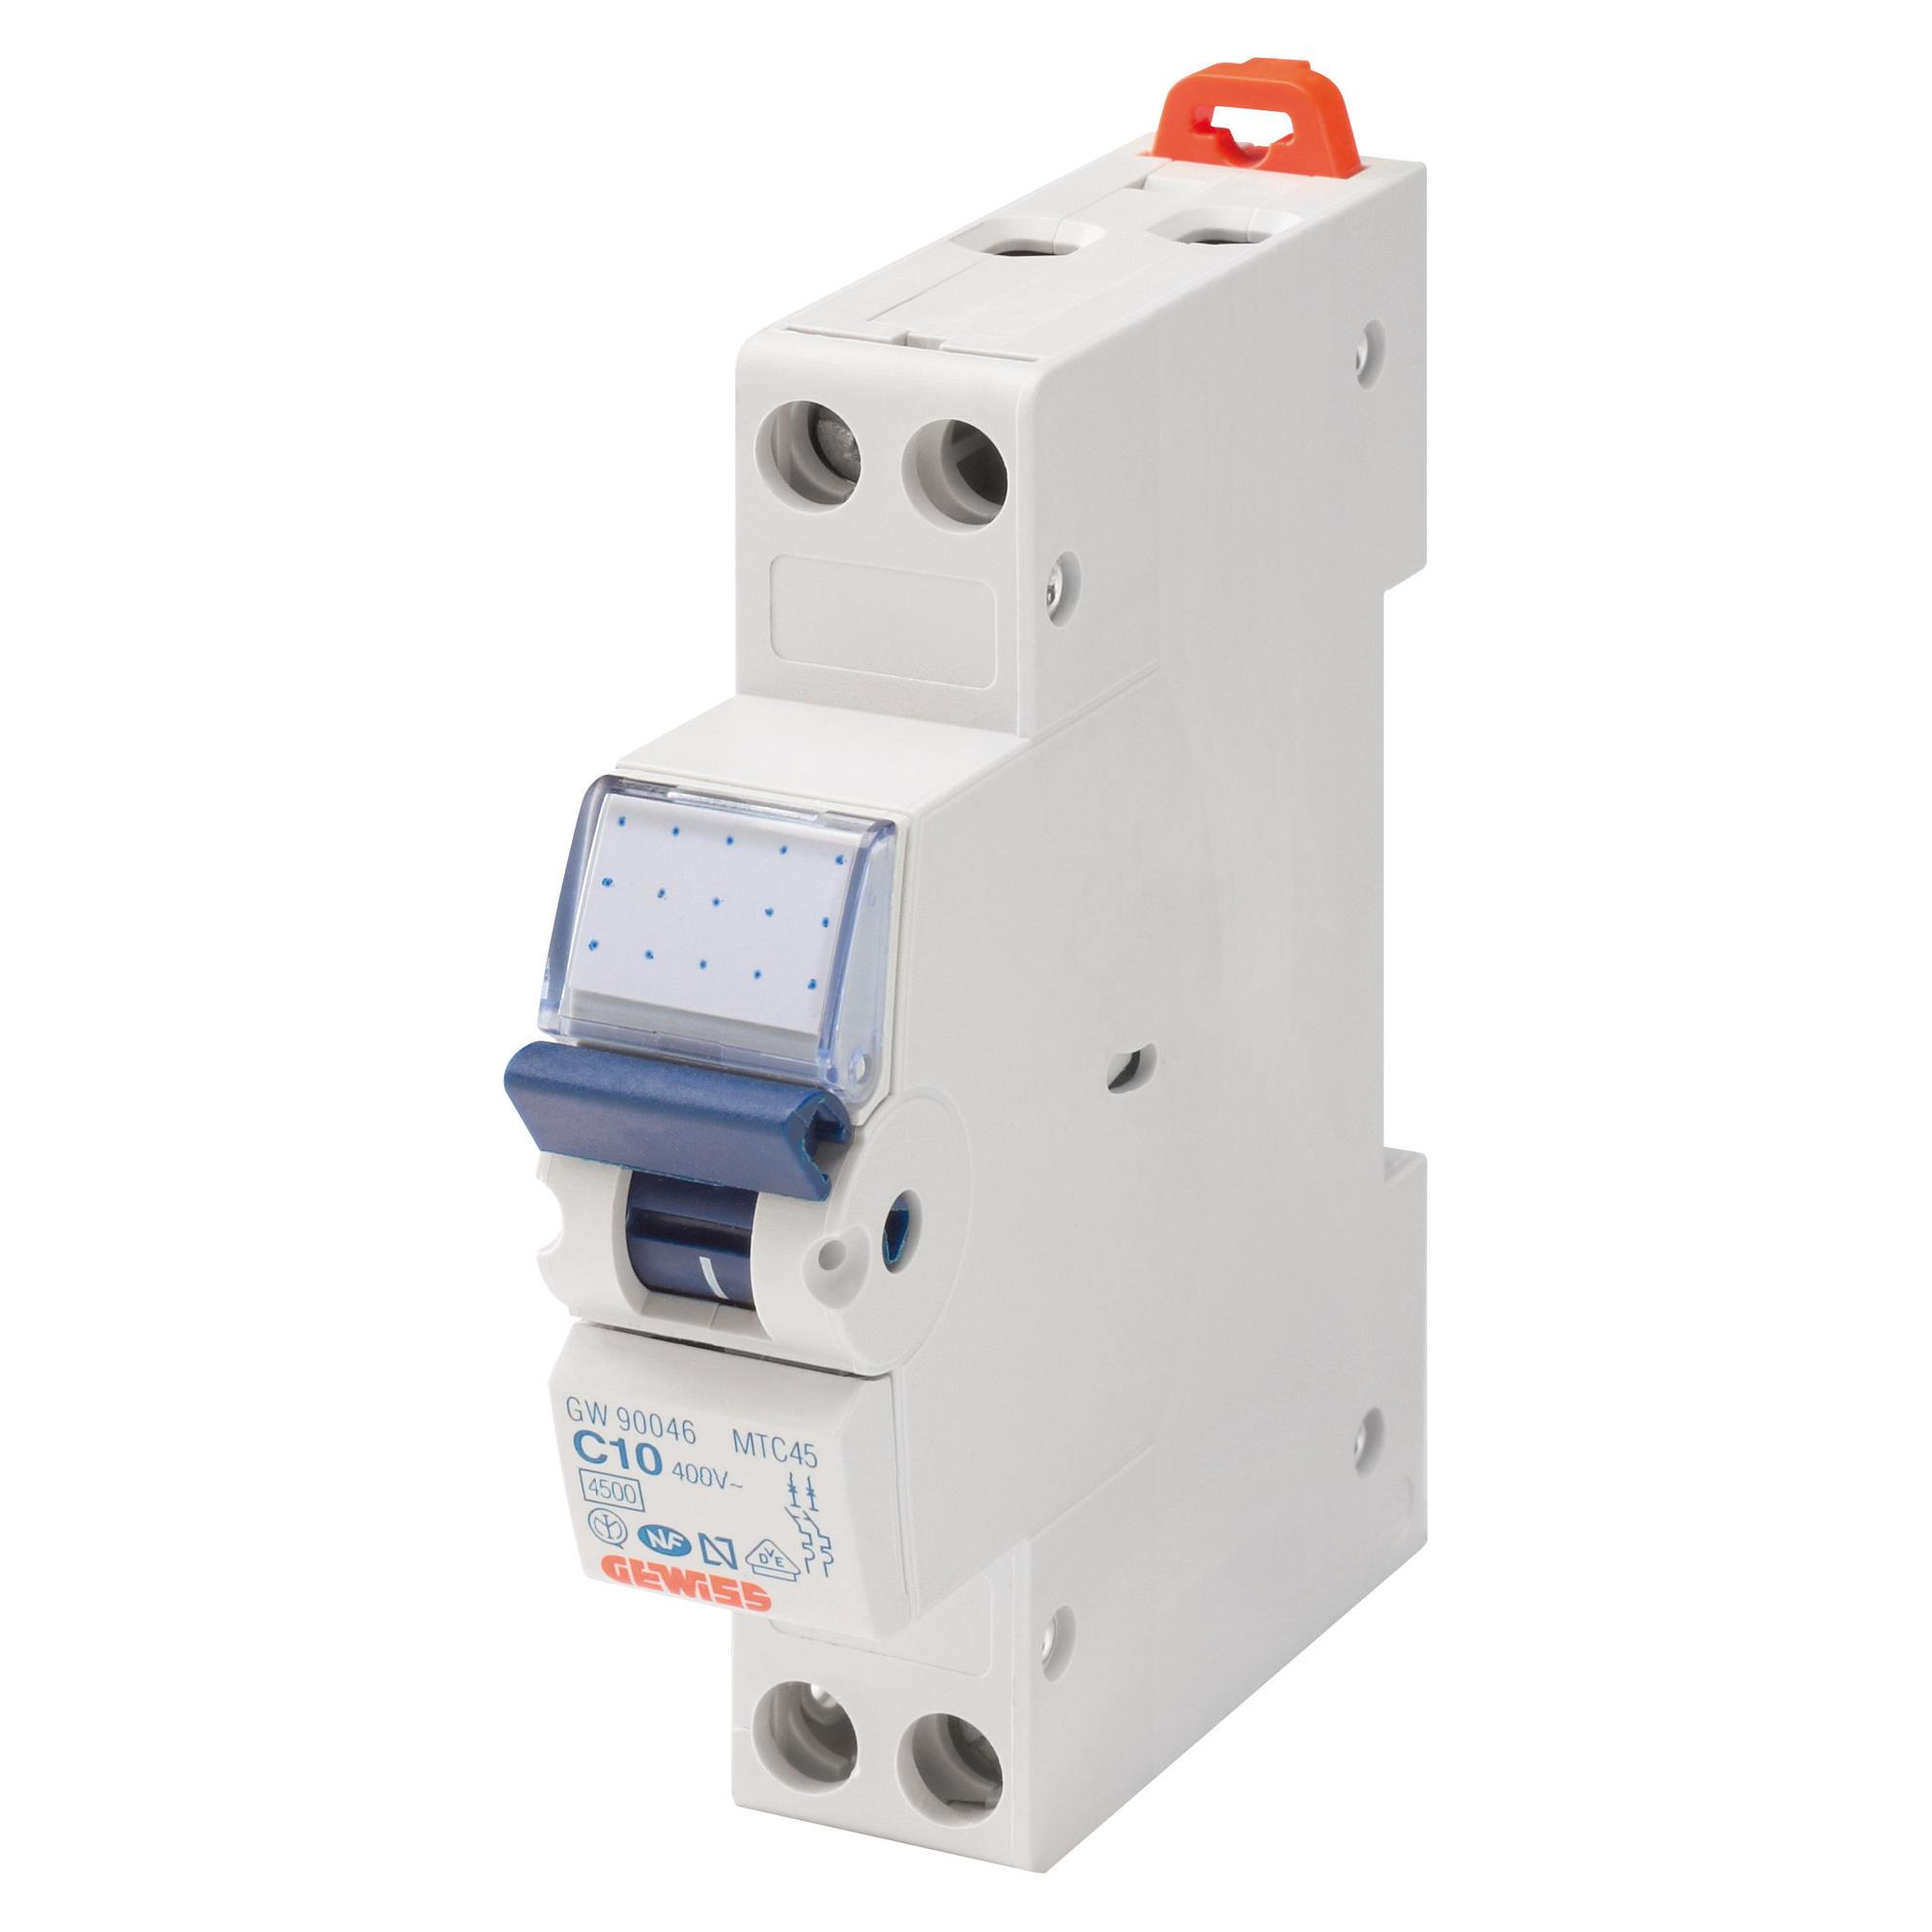 Mcb Gw90246 Gewiss 220v 2 Pole 63a Mini Circuit Breaker Buy Representative Image Download Photo